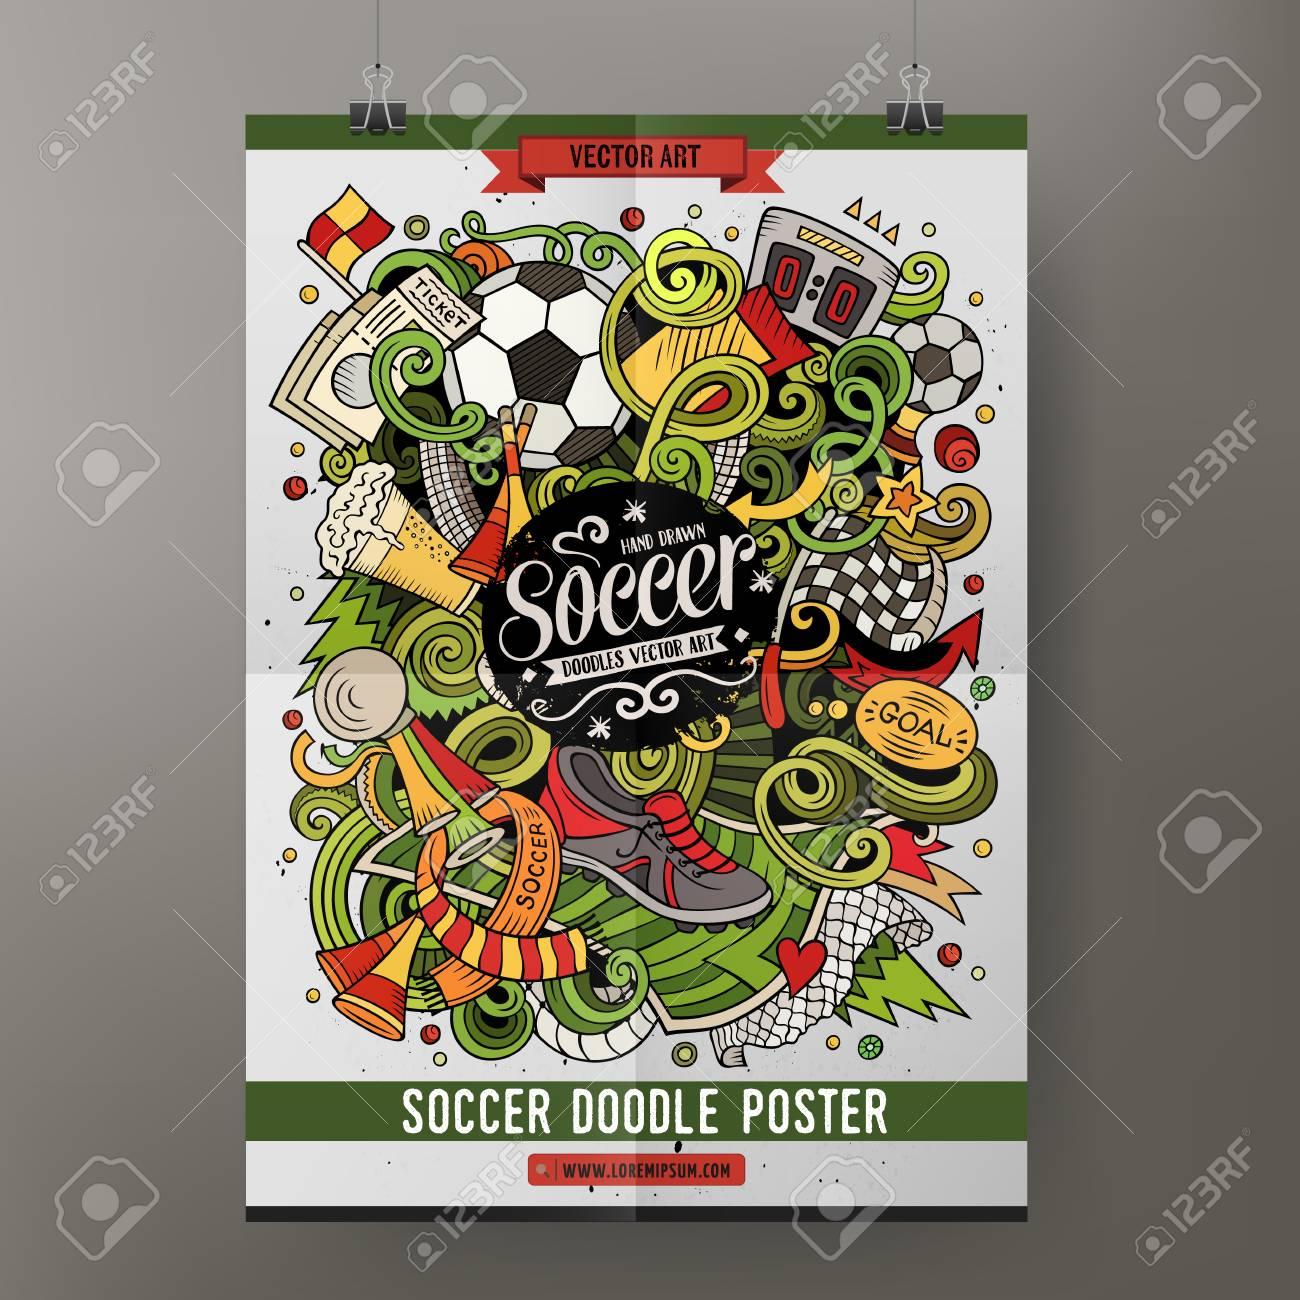 Cartoon Vector Hand Drawn Doodles Soccer Poster Template Stock